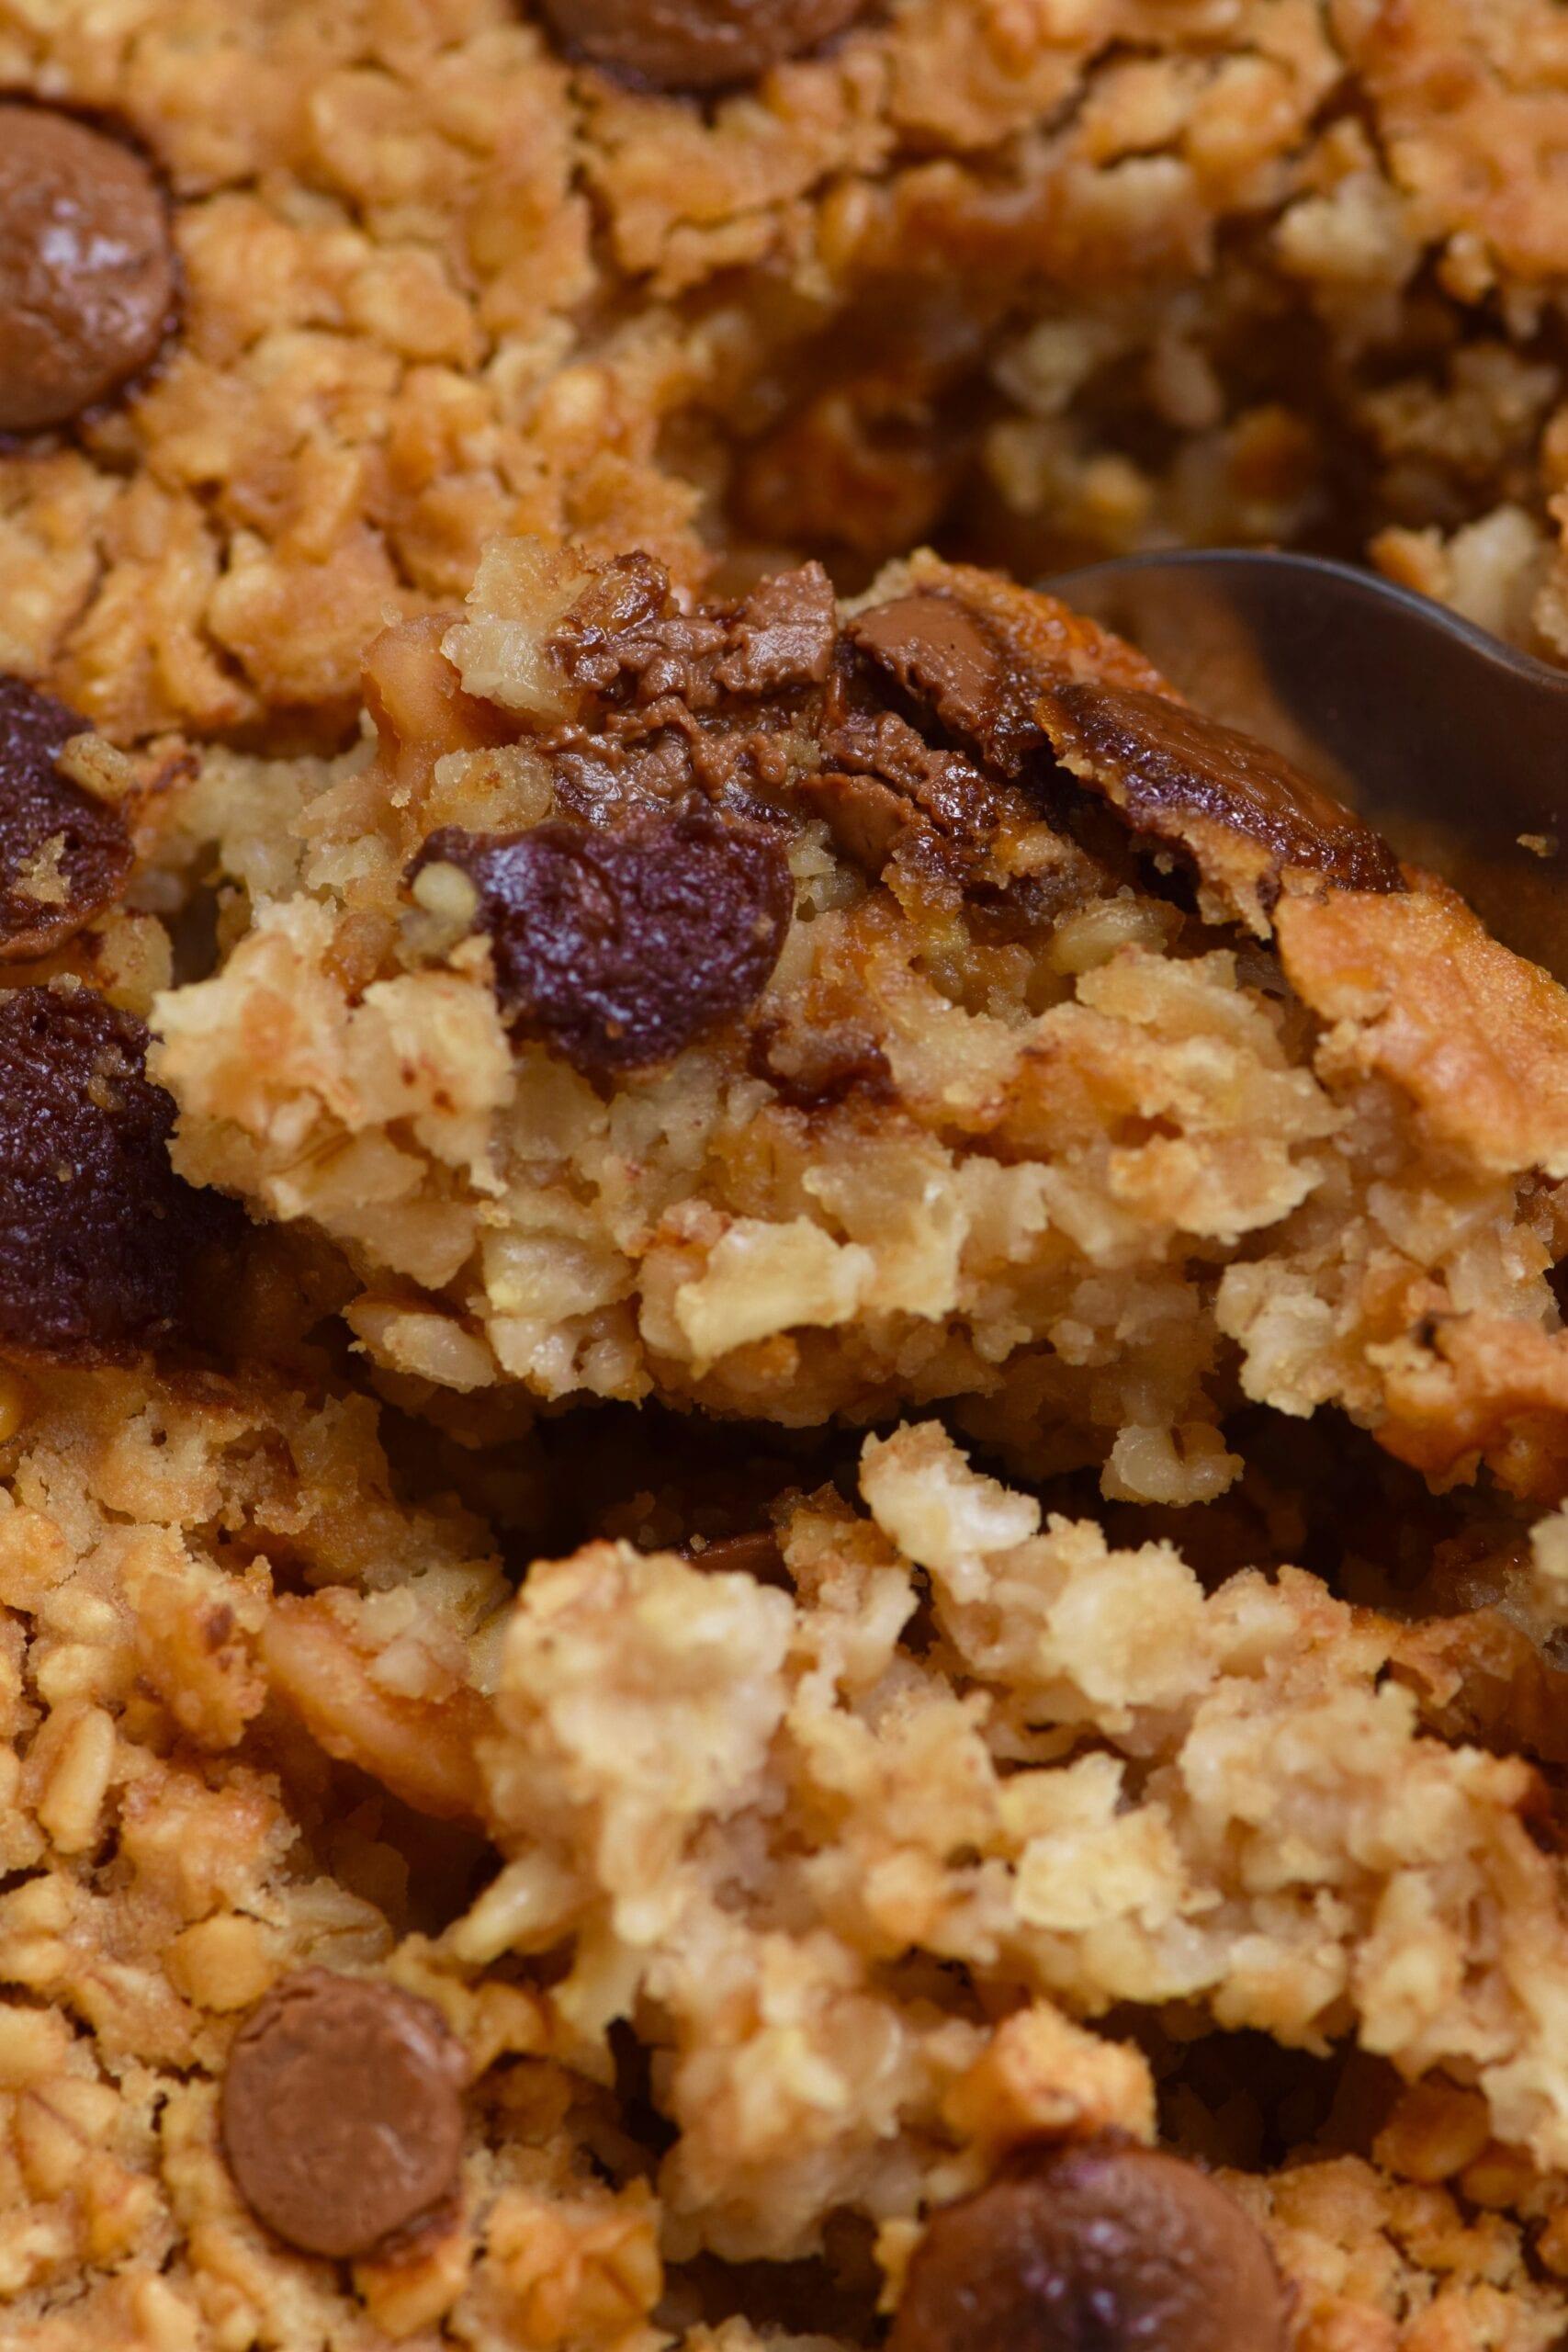 Chocolate chunk baked oatmeal closeup